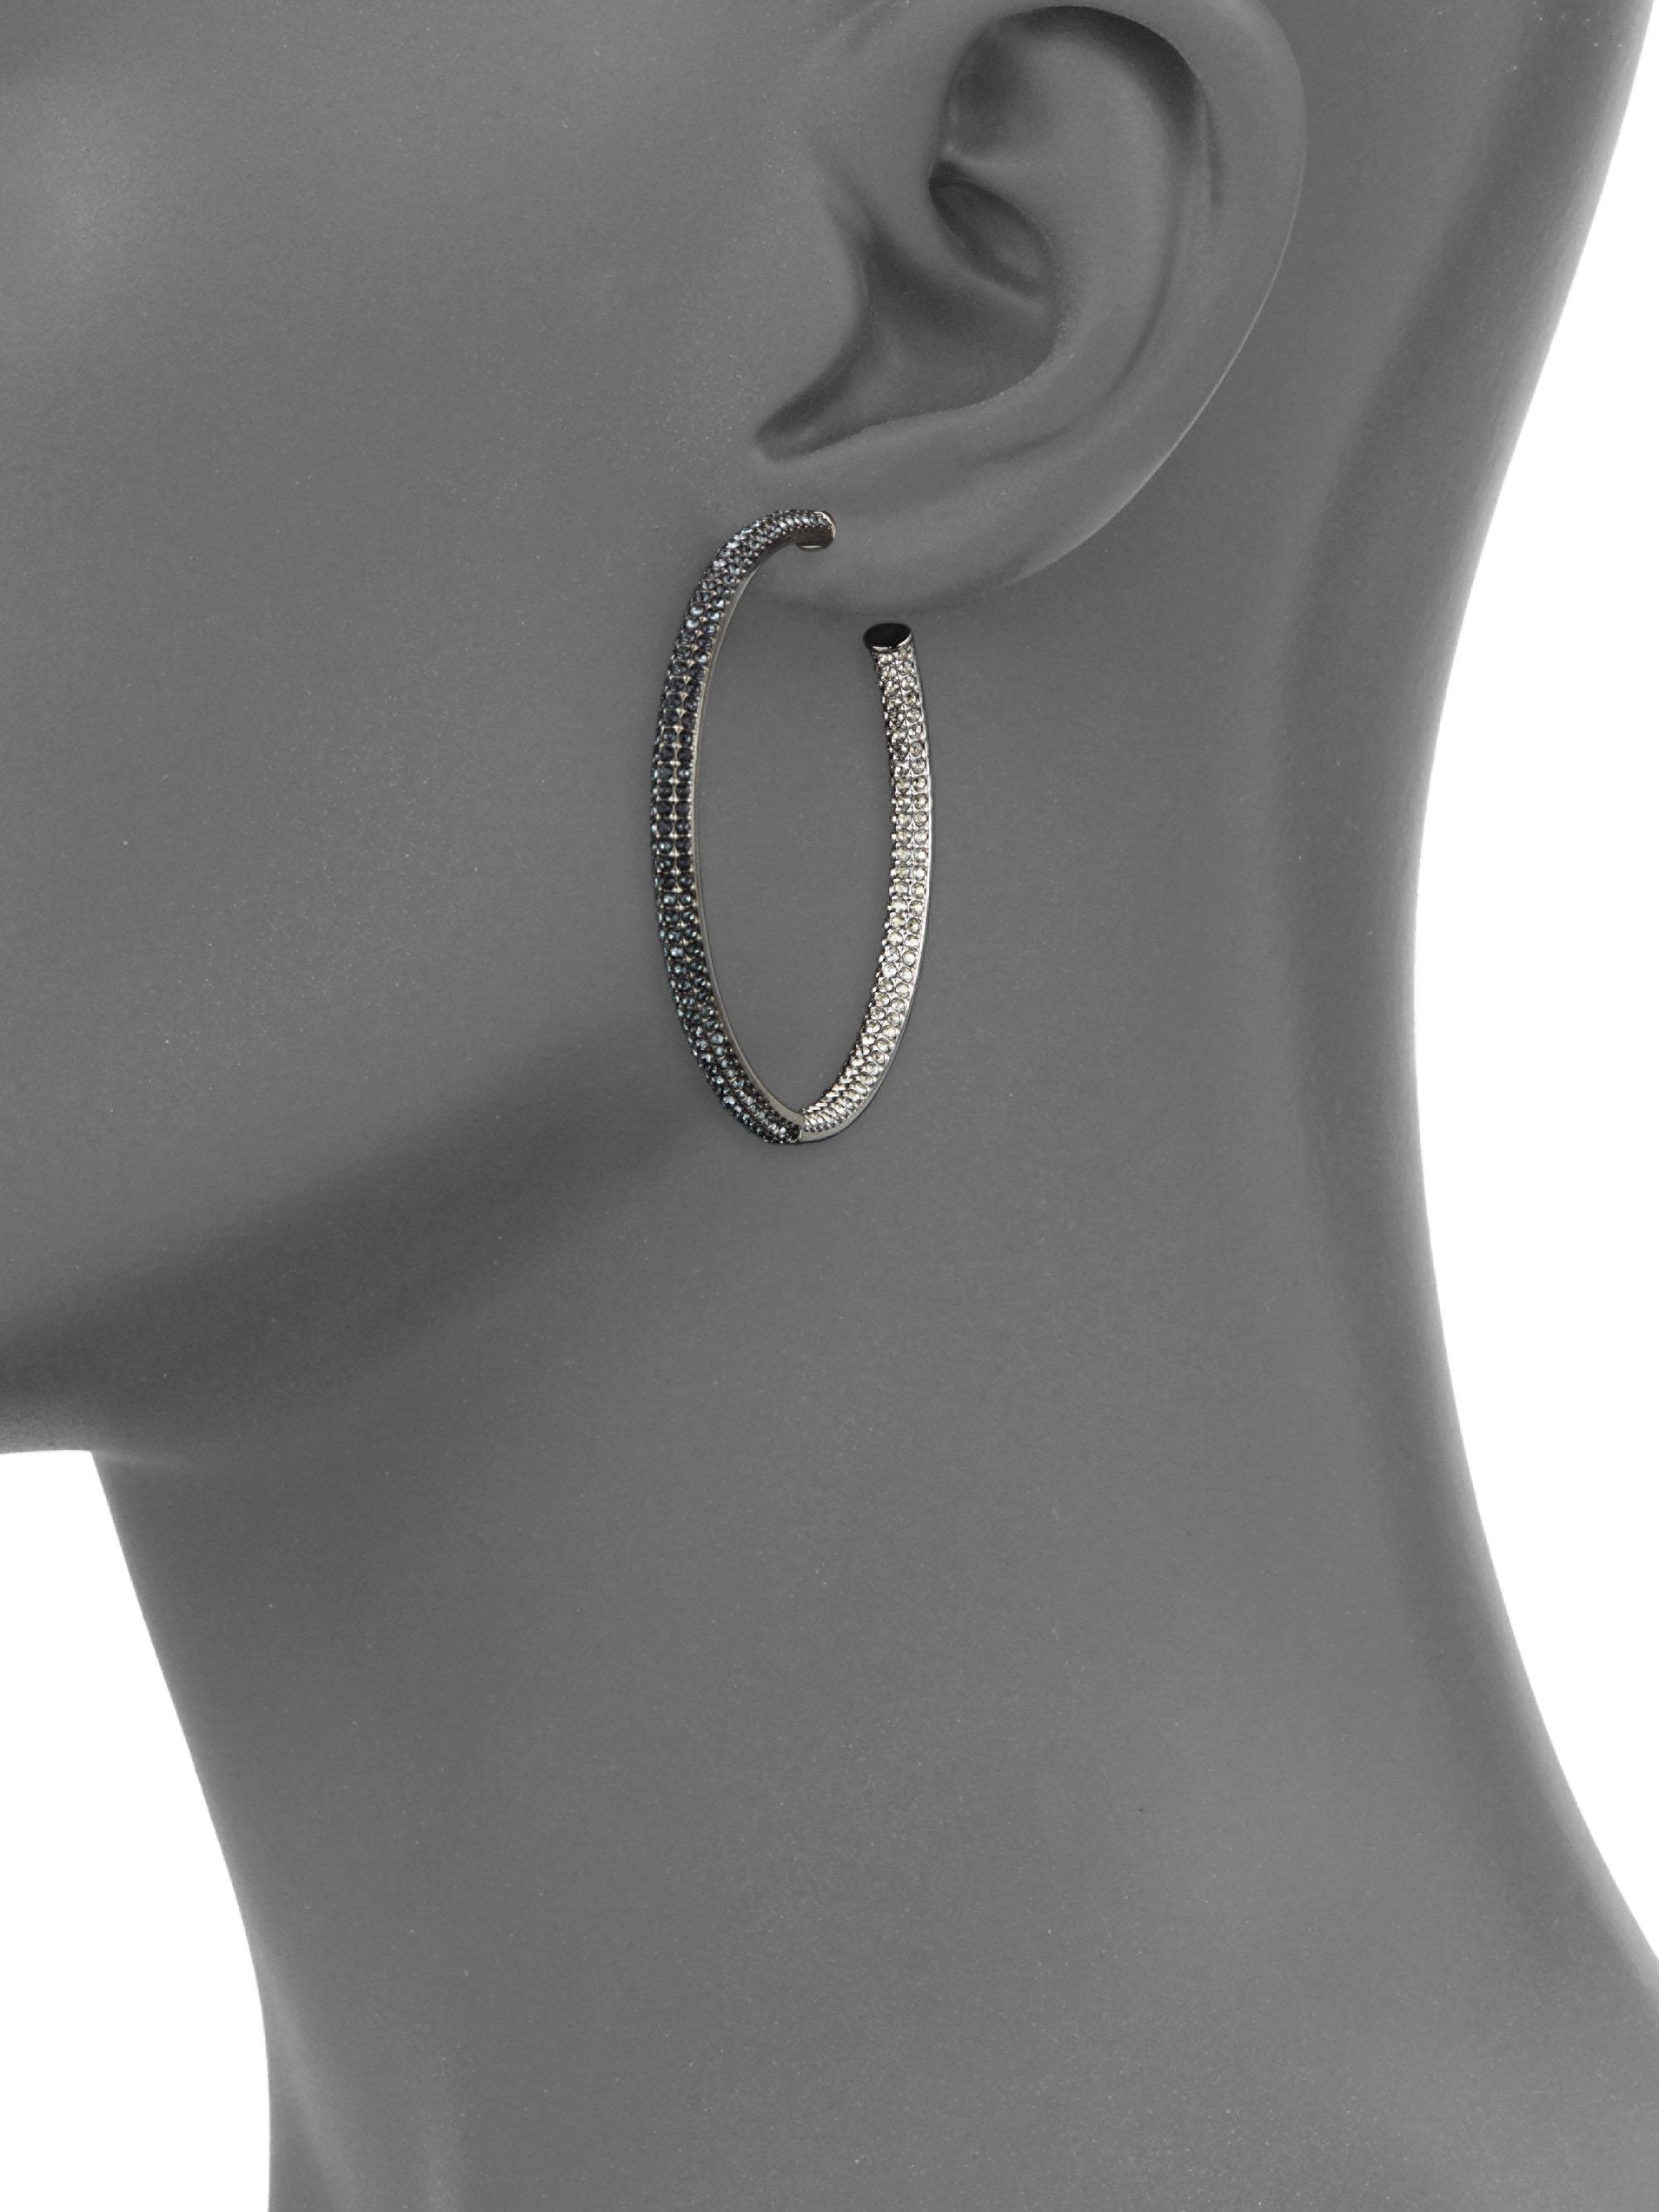 dfef3991d0e20 Adriana Orsini Metallic Two-tone Pave Swarovski Crystal Hoop Earrings/1.5